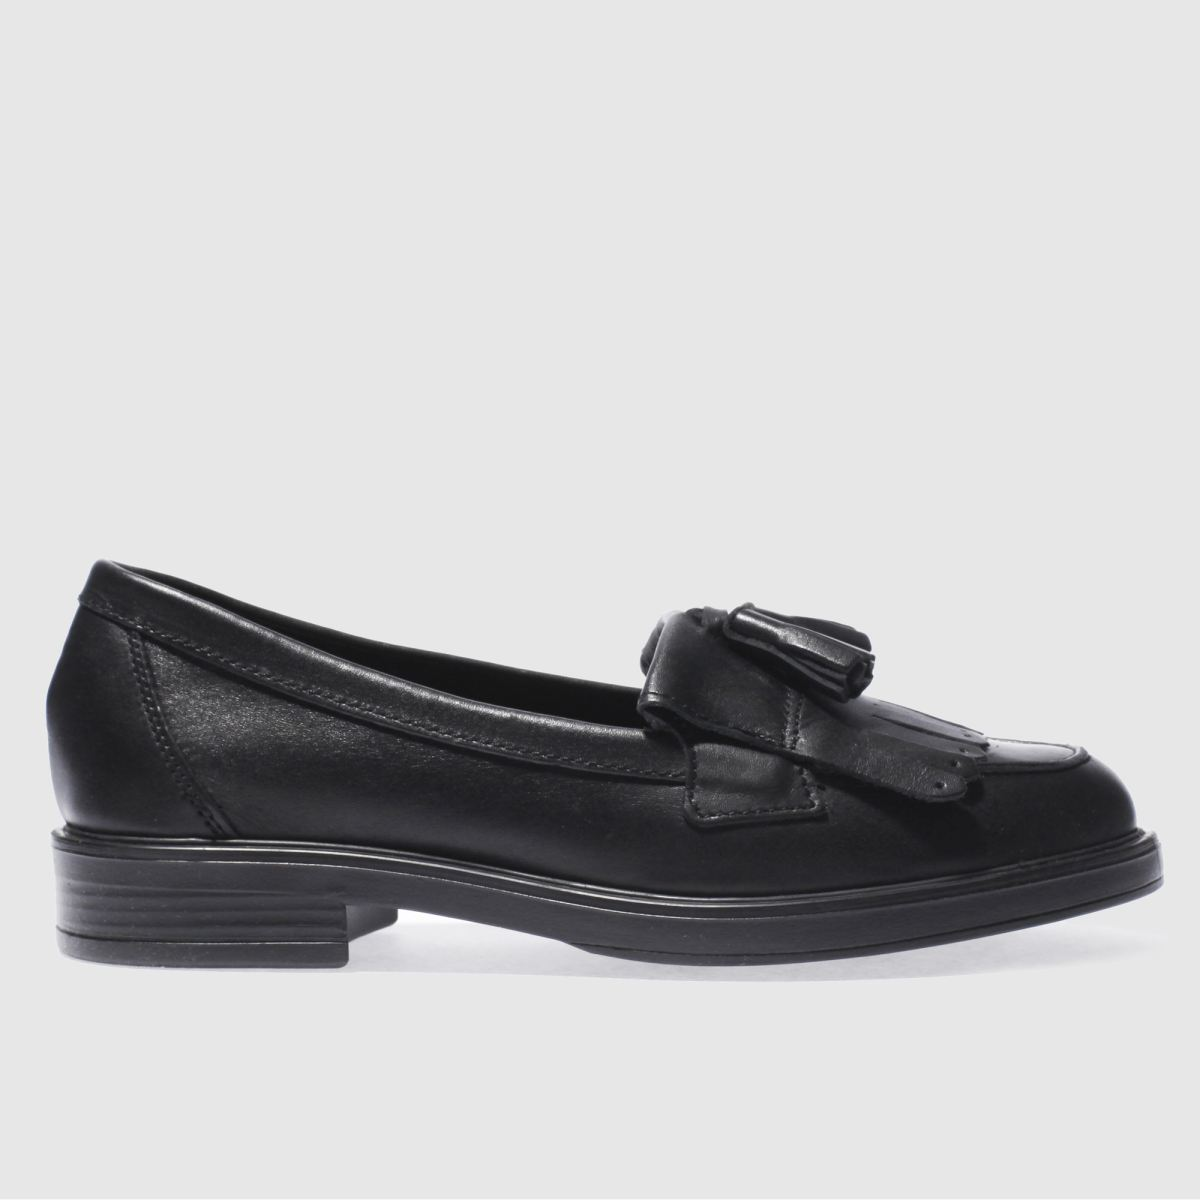 Schuh Black Compass Ii Flat Shoes